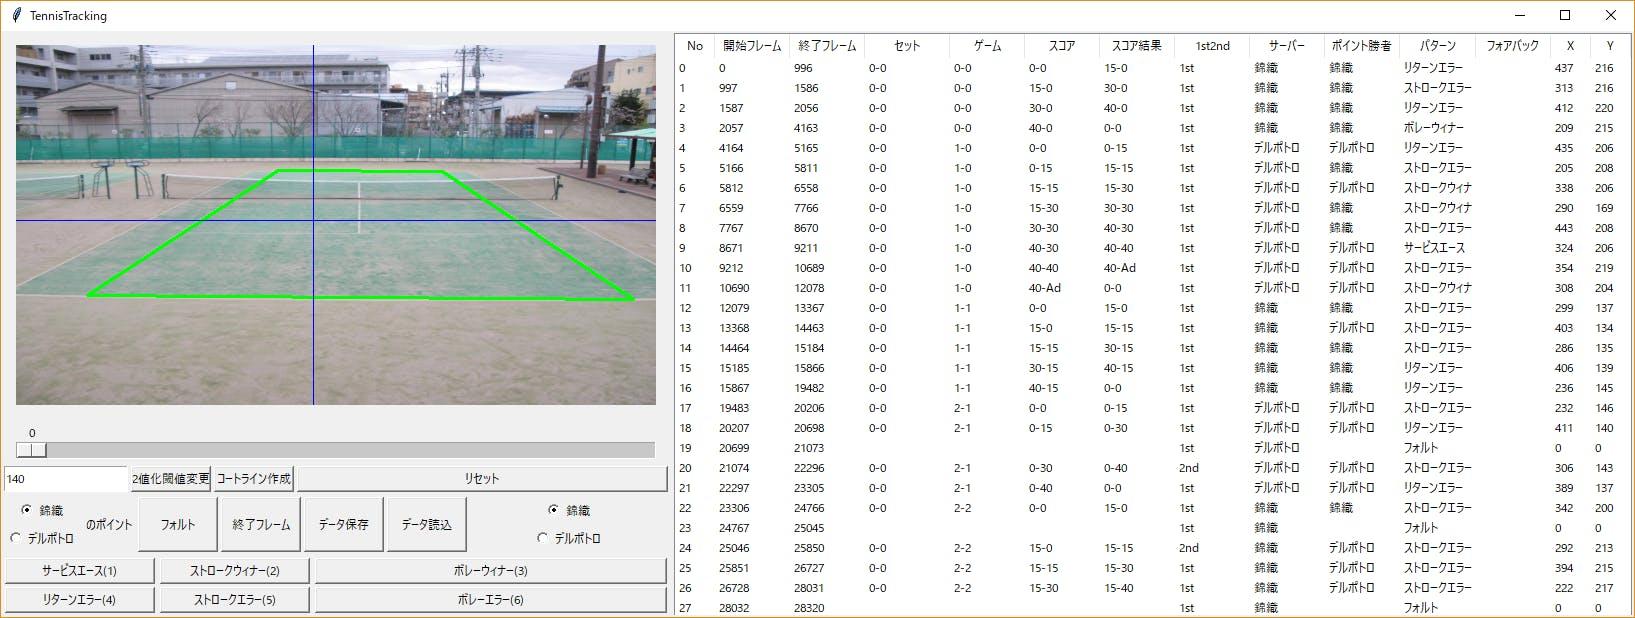 Opencv Videocapture Flush